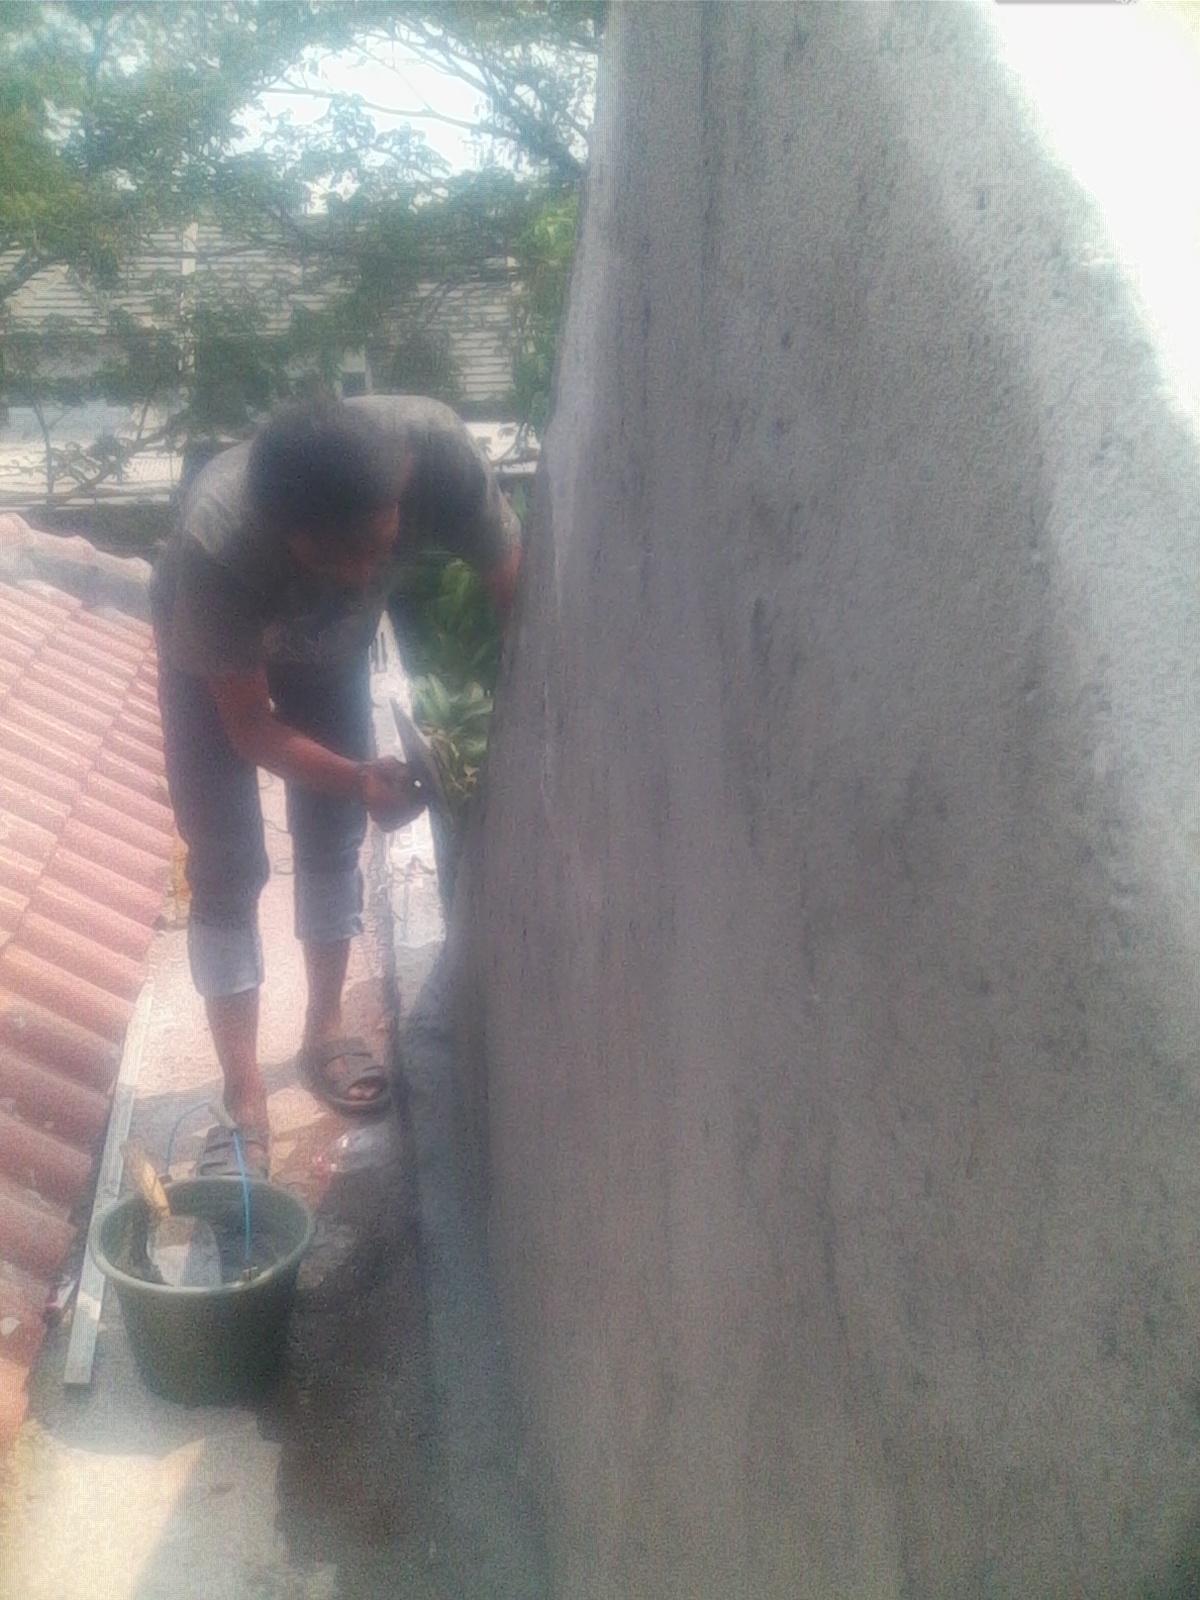 Perbaikan Rumah Renovasi Jasa Bangunan Bangun Tukang Batu Kayu Besi Kondasi